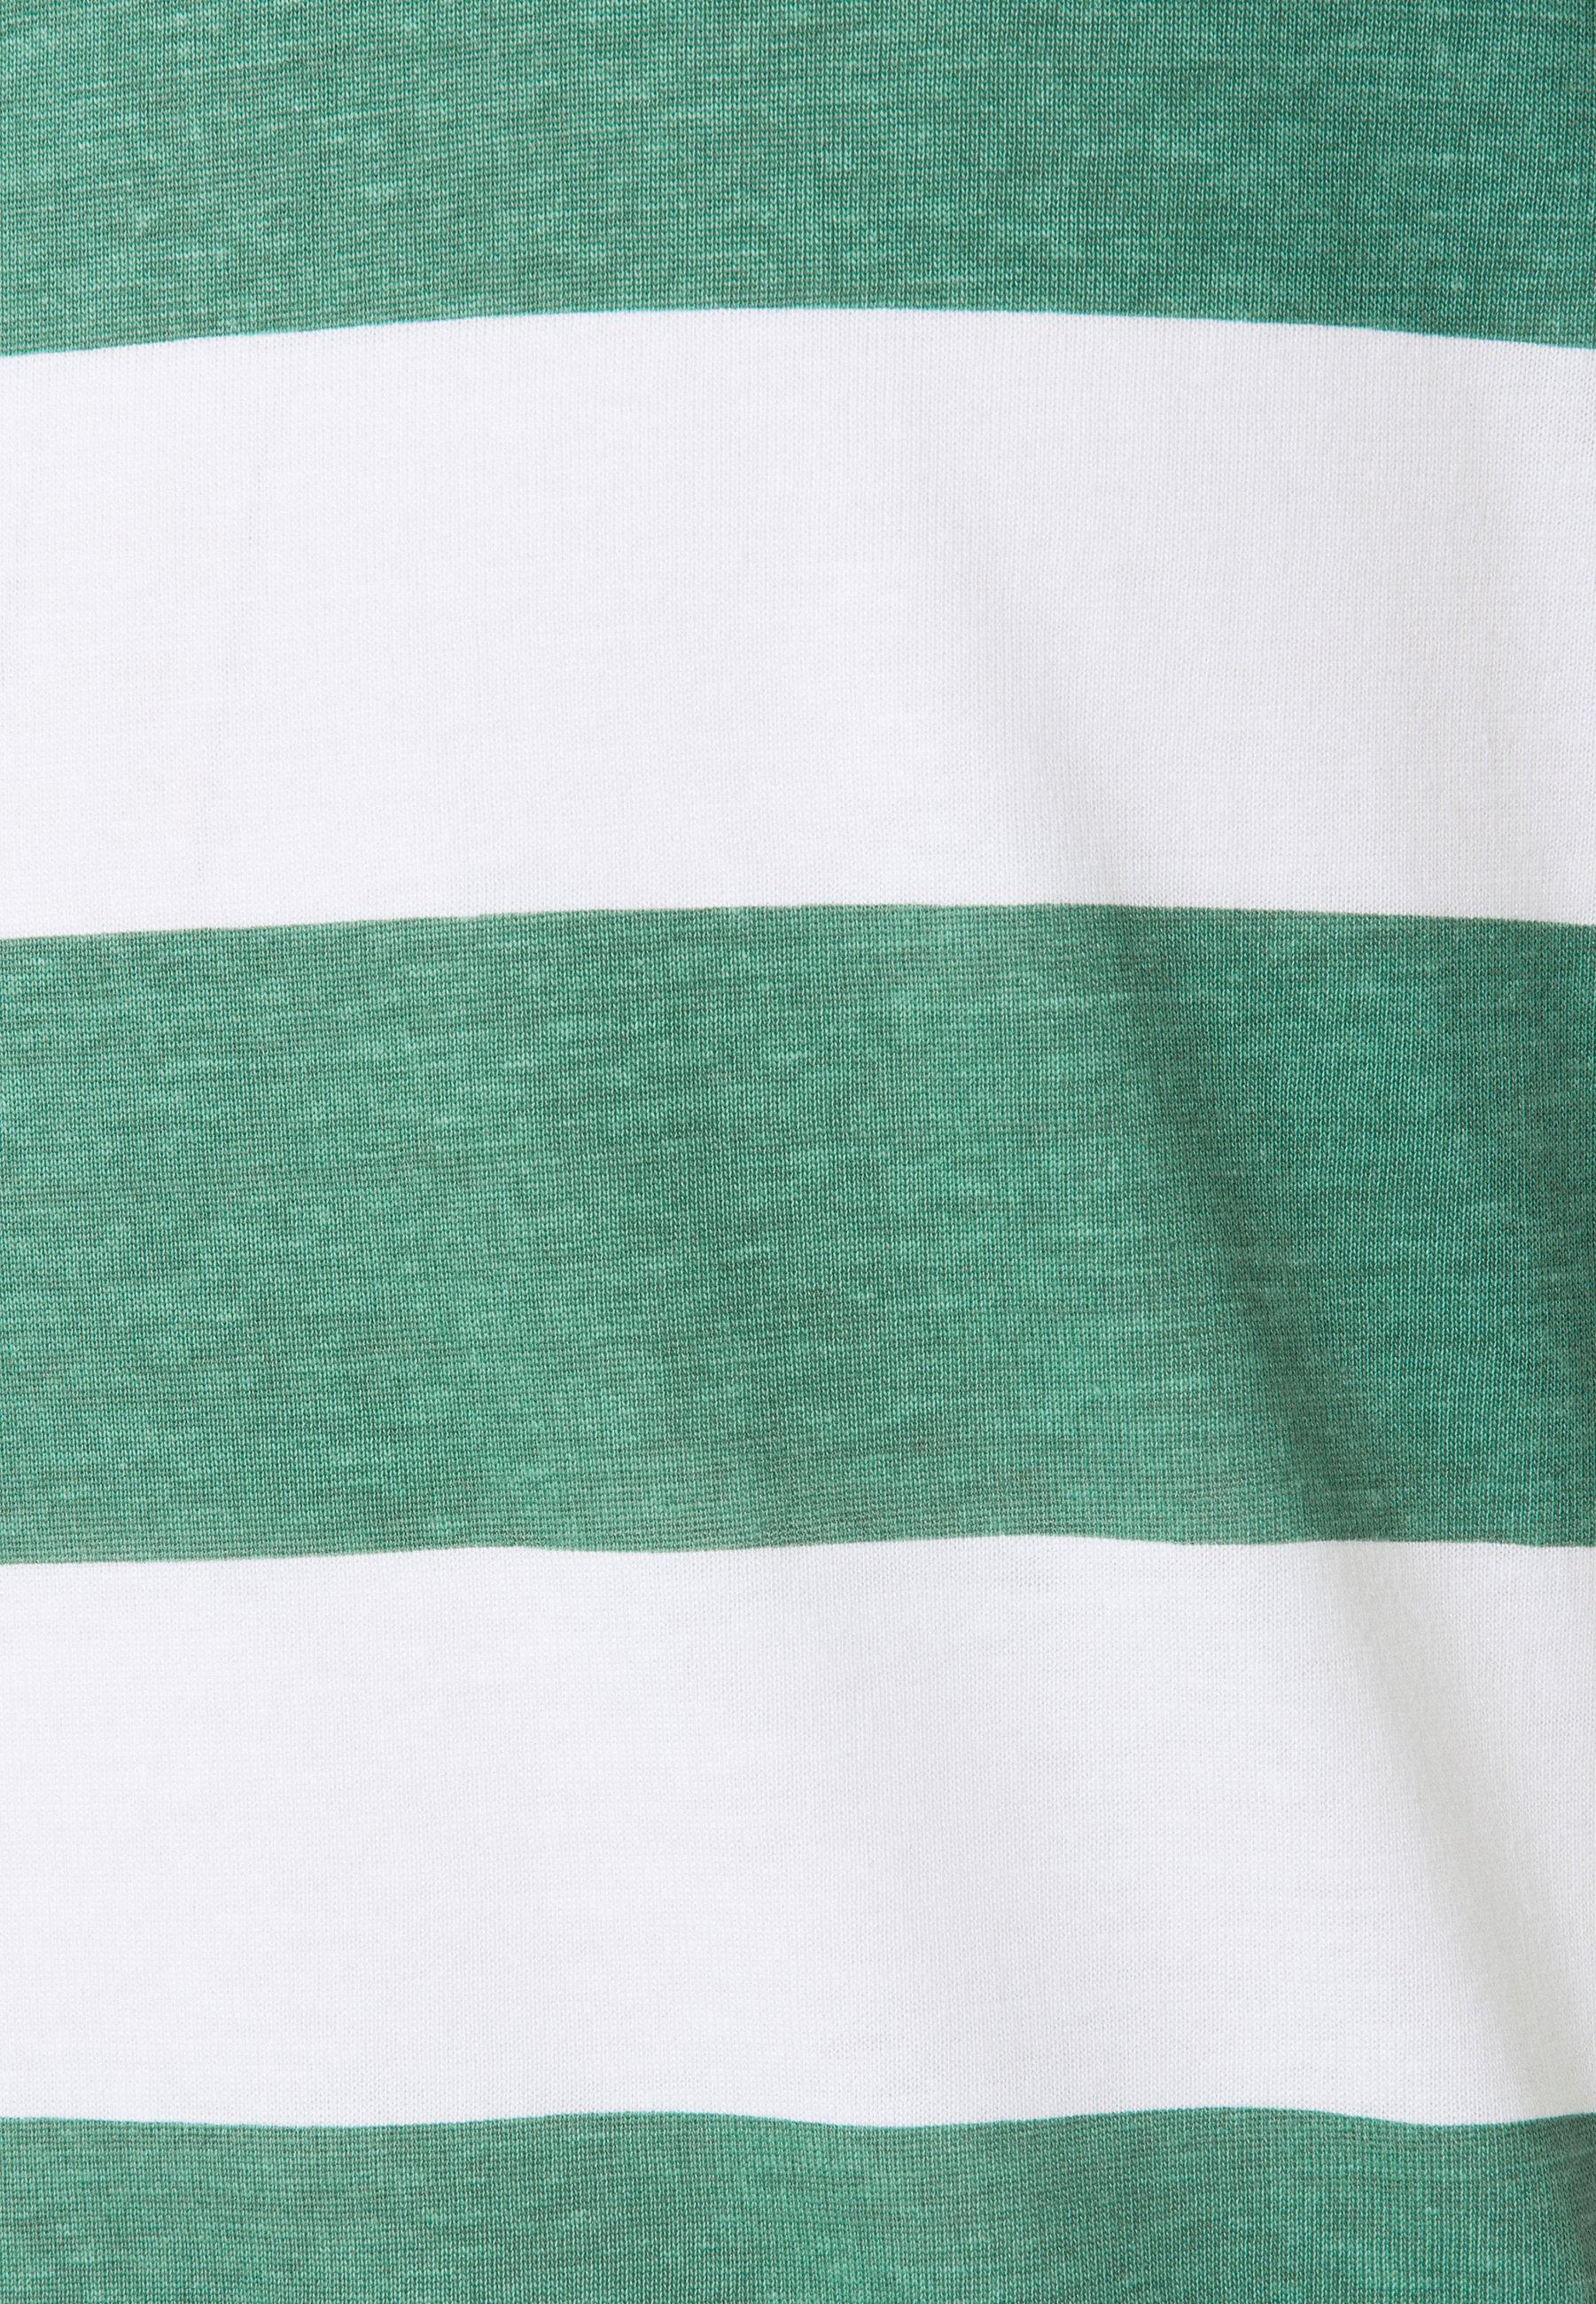 Brave Soul Print T-shirt - jade green/ white 7zRWQ